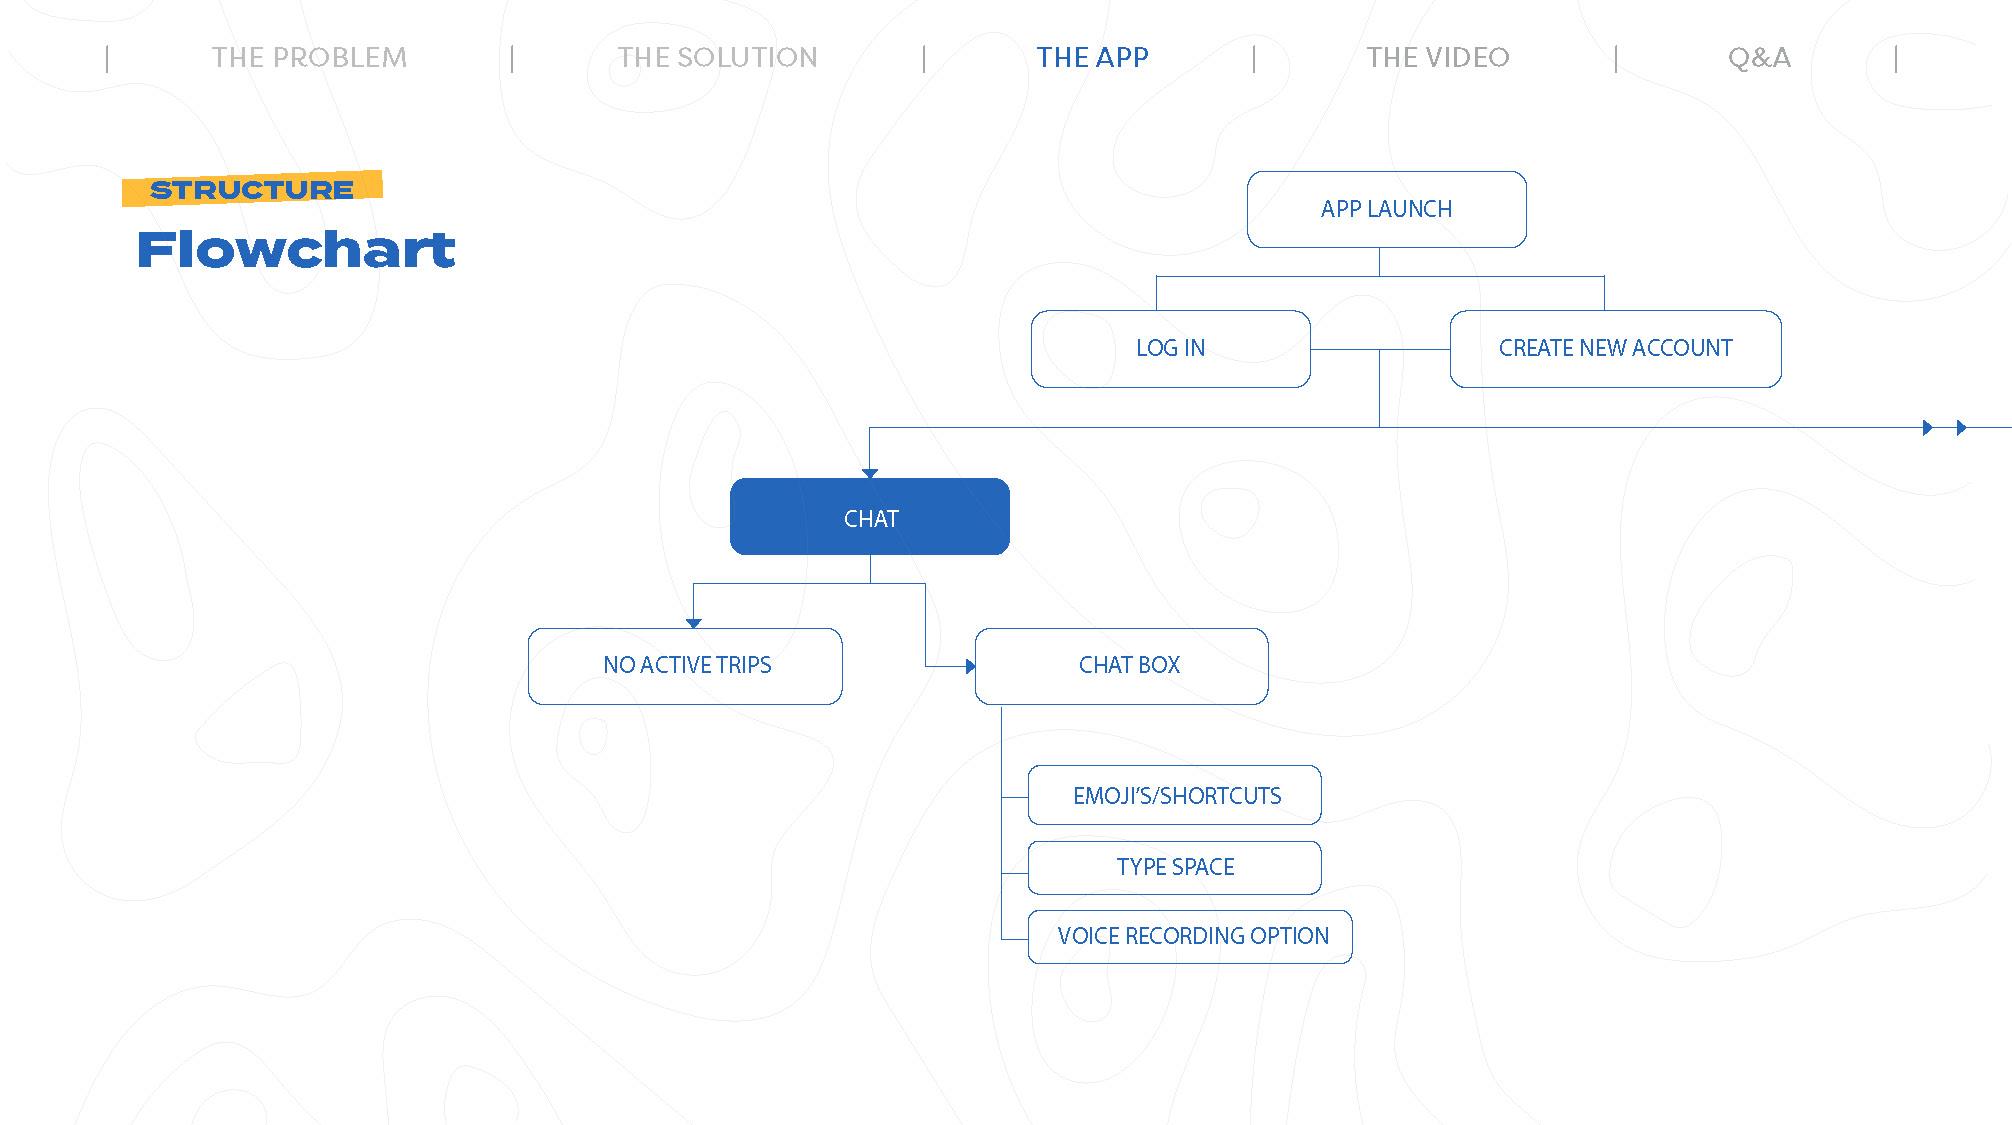 EXC3_Trippin_Presentation_FINAL_Page_23.jpg